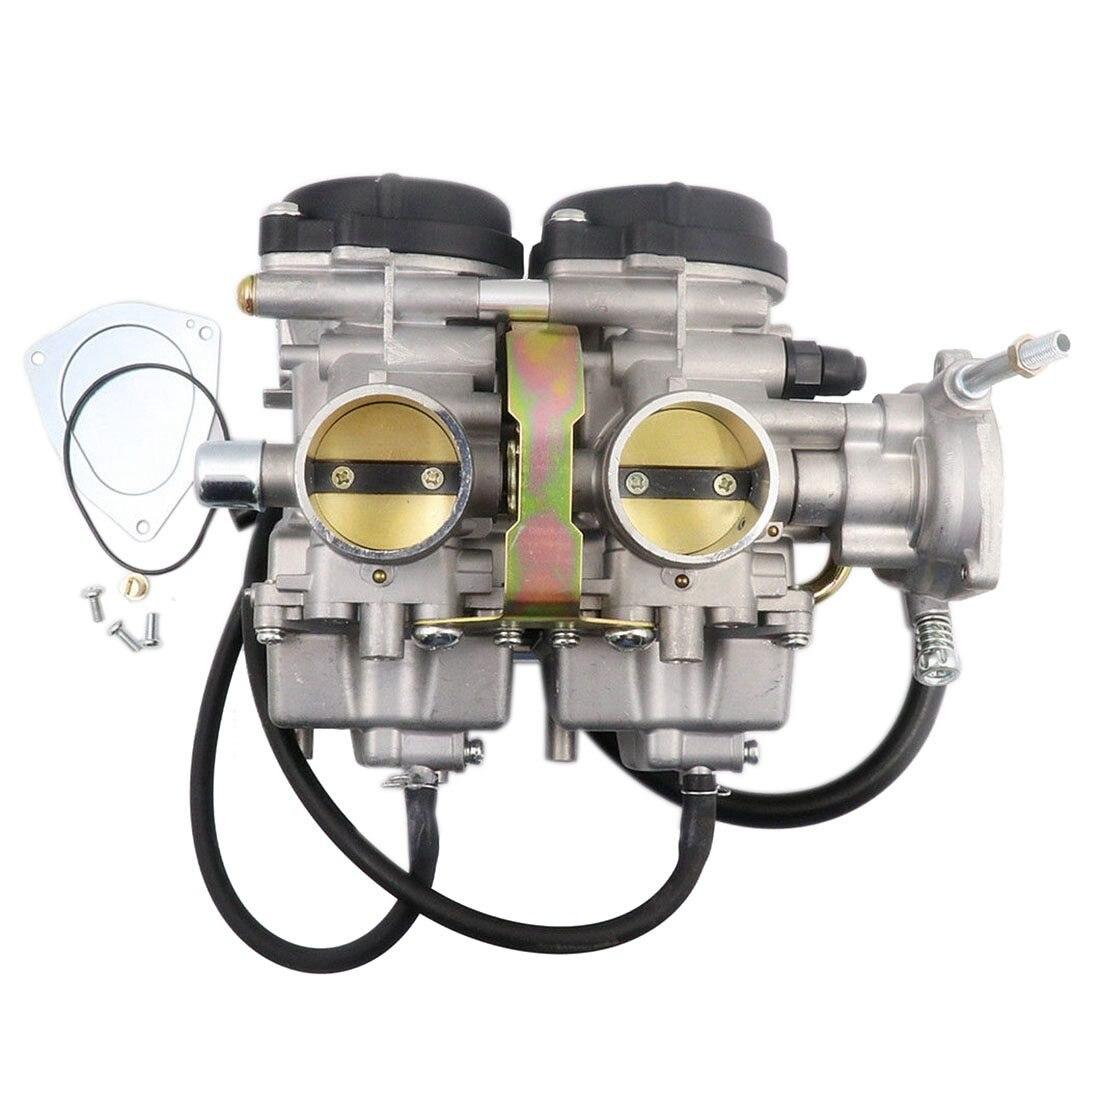 AUTO New Carburetor for YAMAHA RAPTOR 660 YFM660 2001 2005 Carb